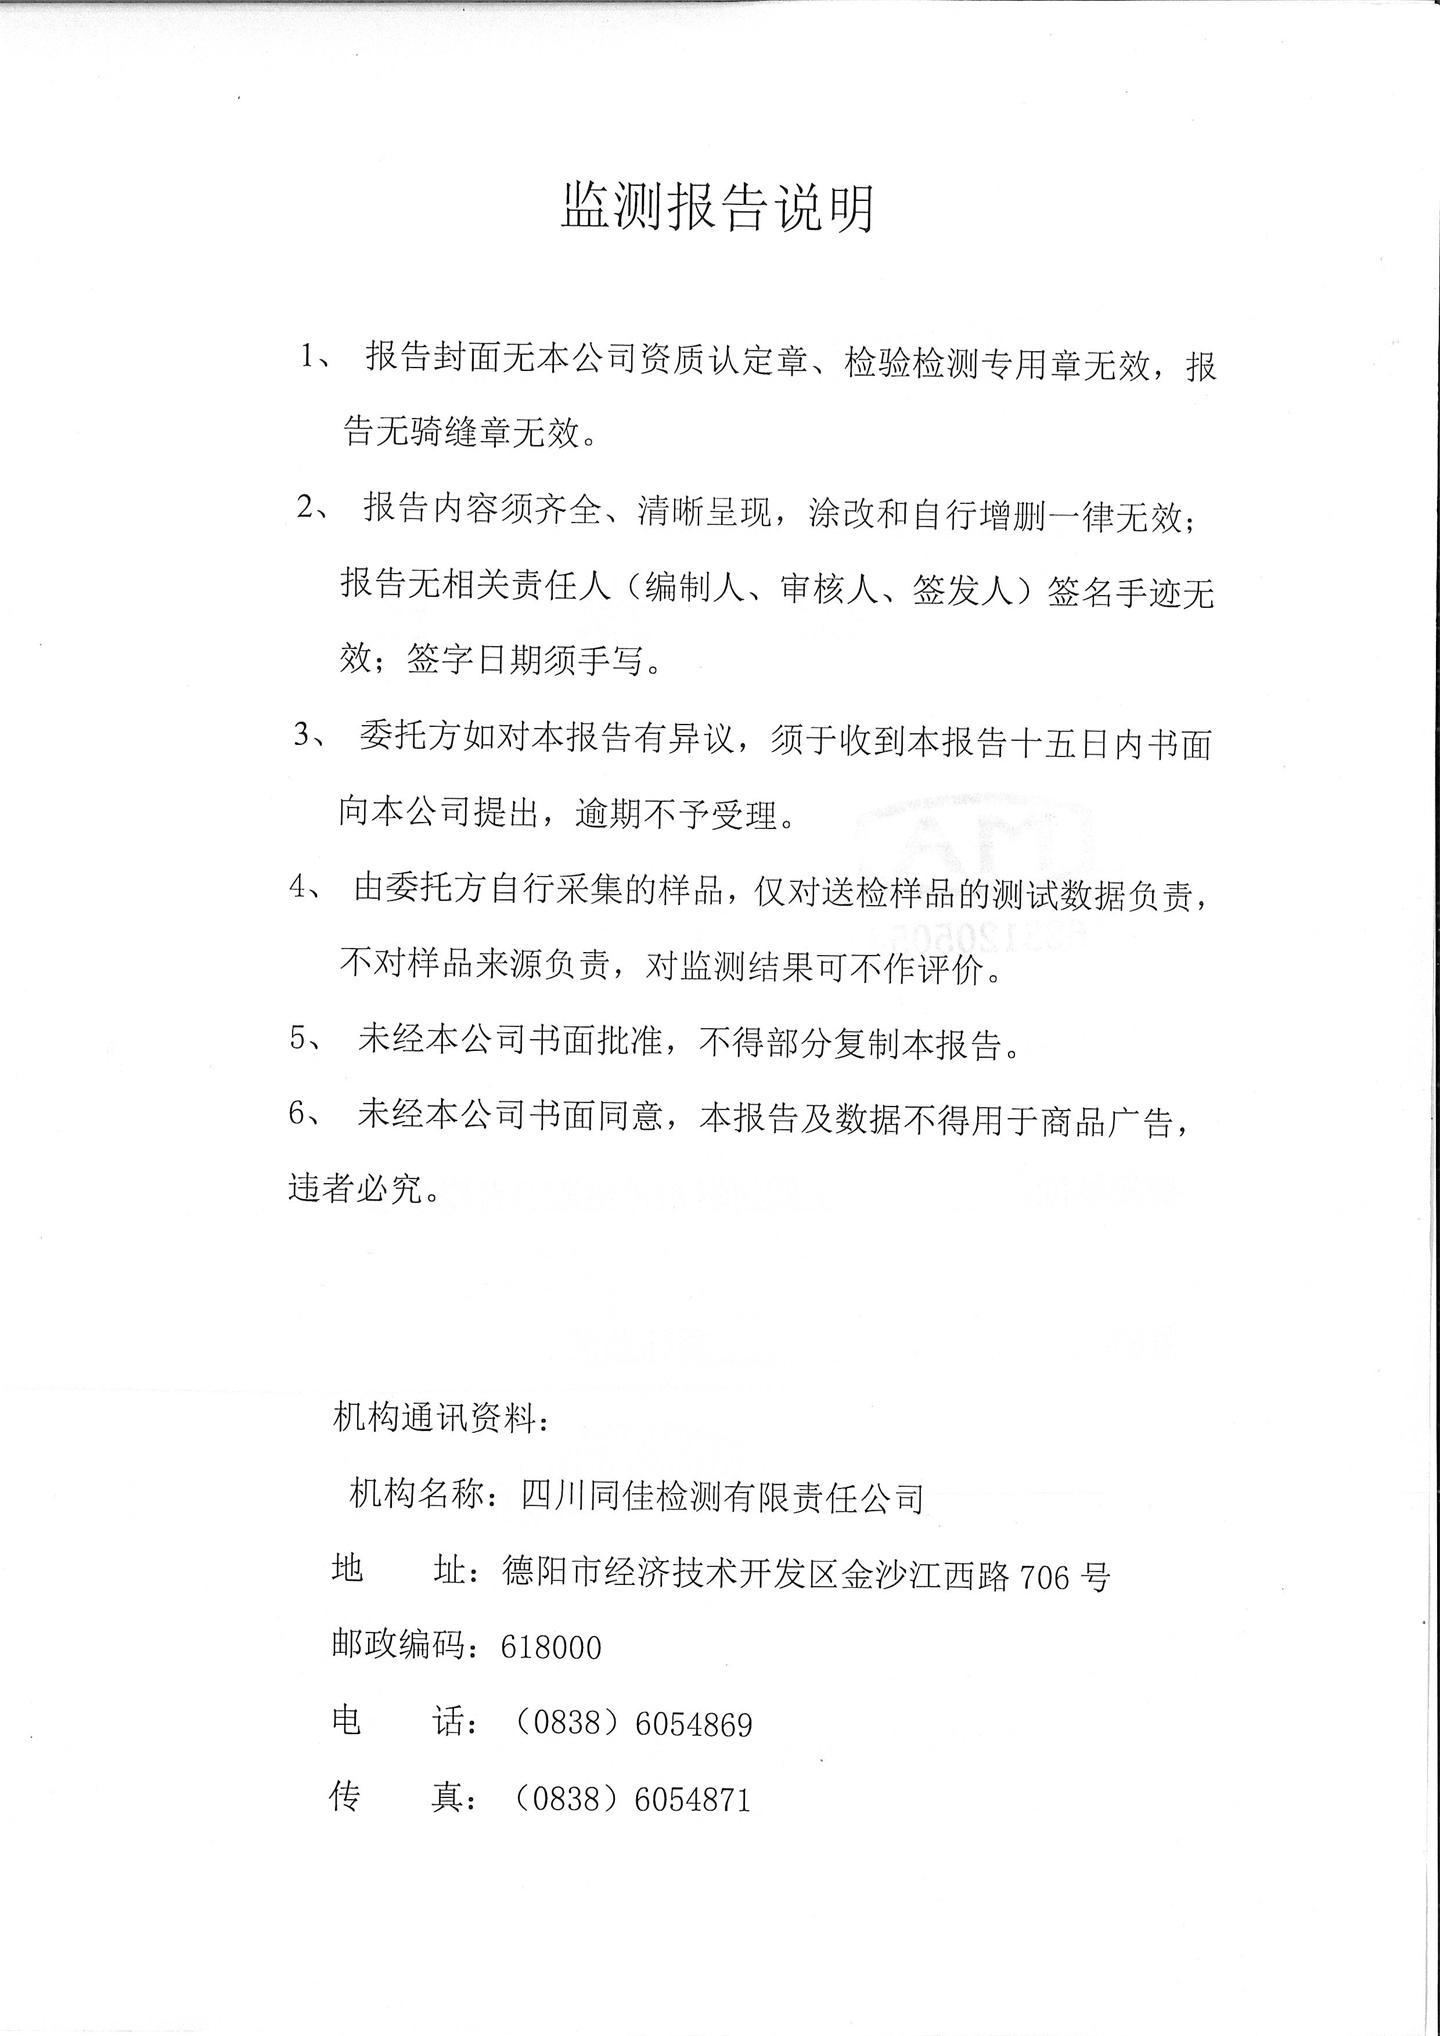 http://qiniu.cloudhong.com/image_2019-01-22_5c46160e07373.jpg